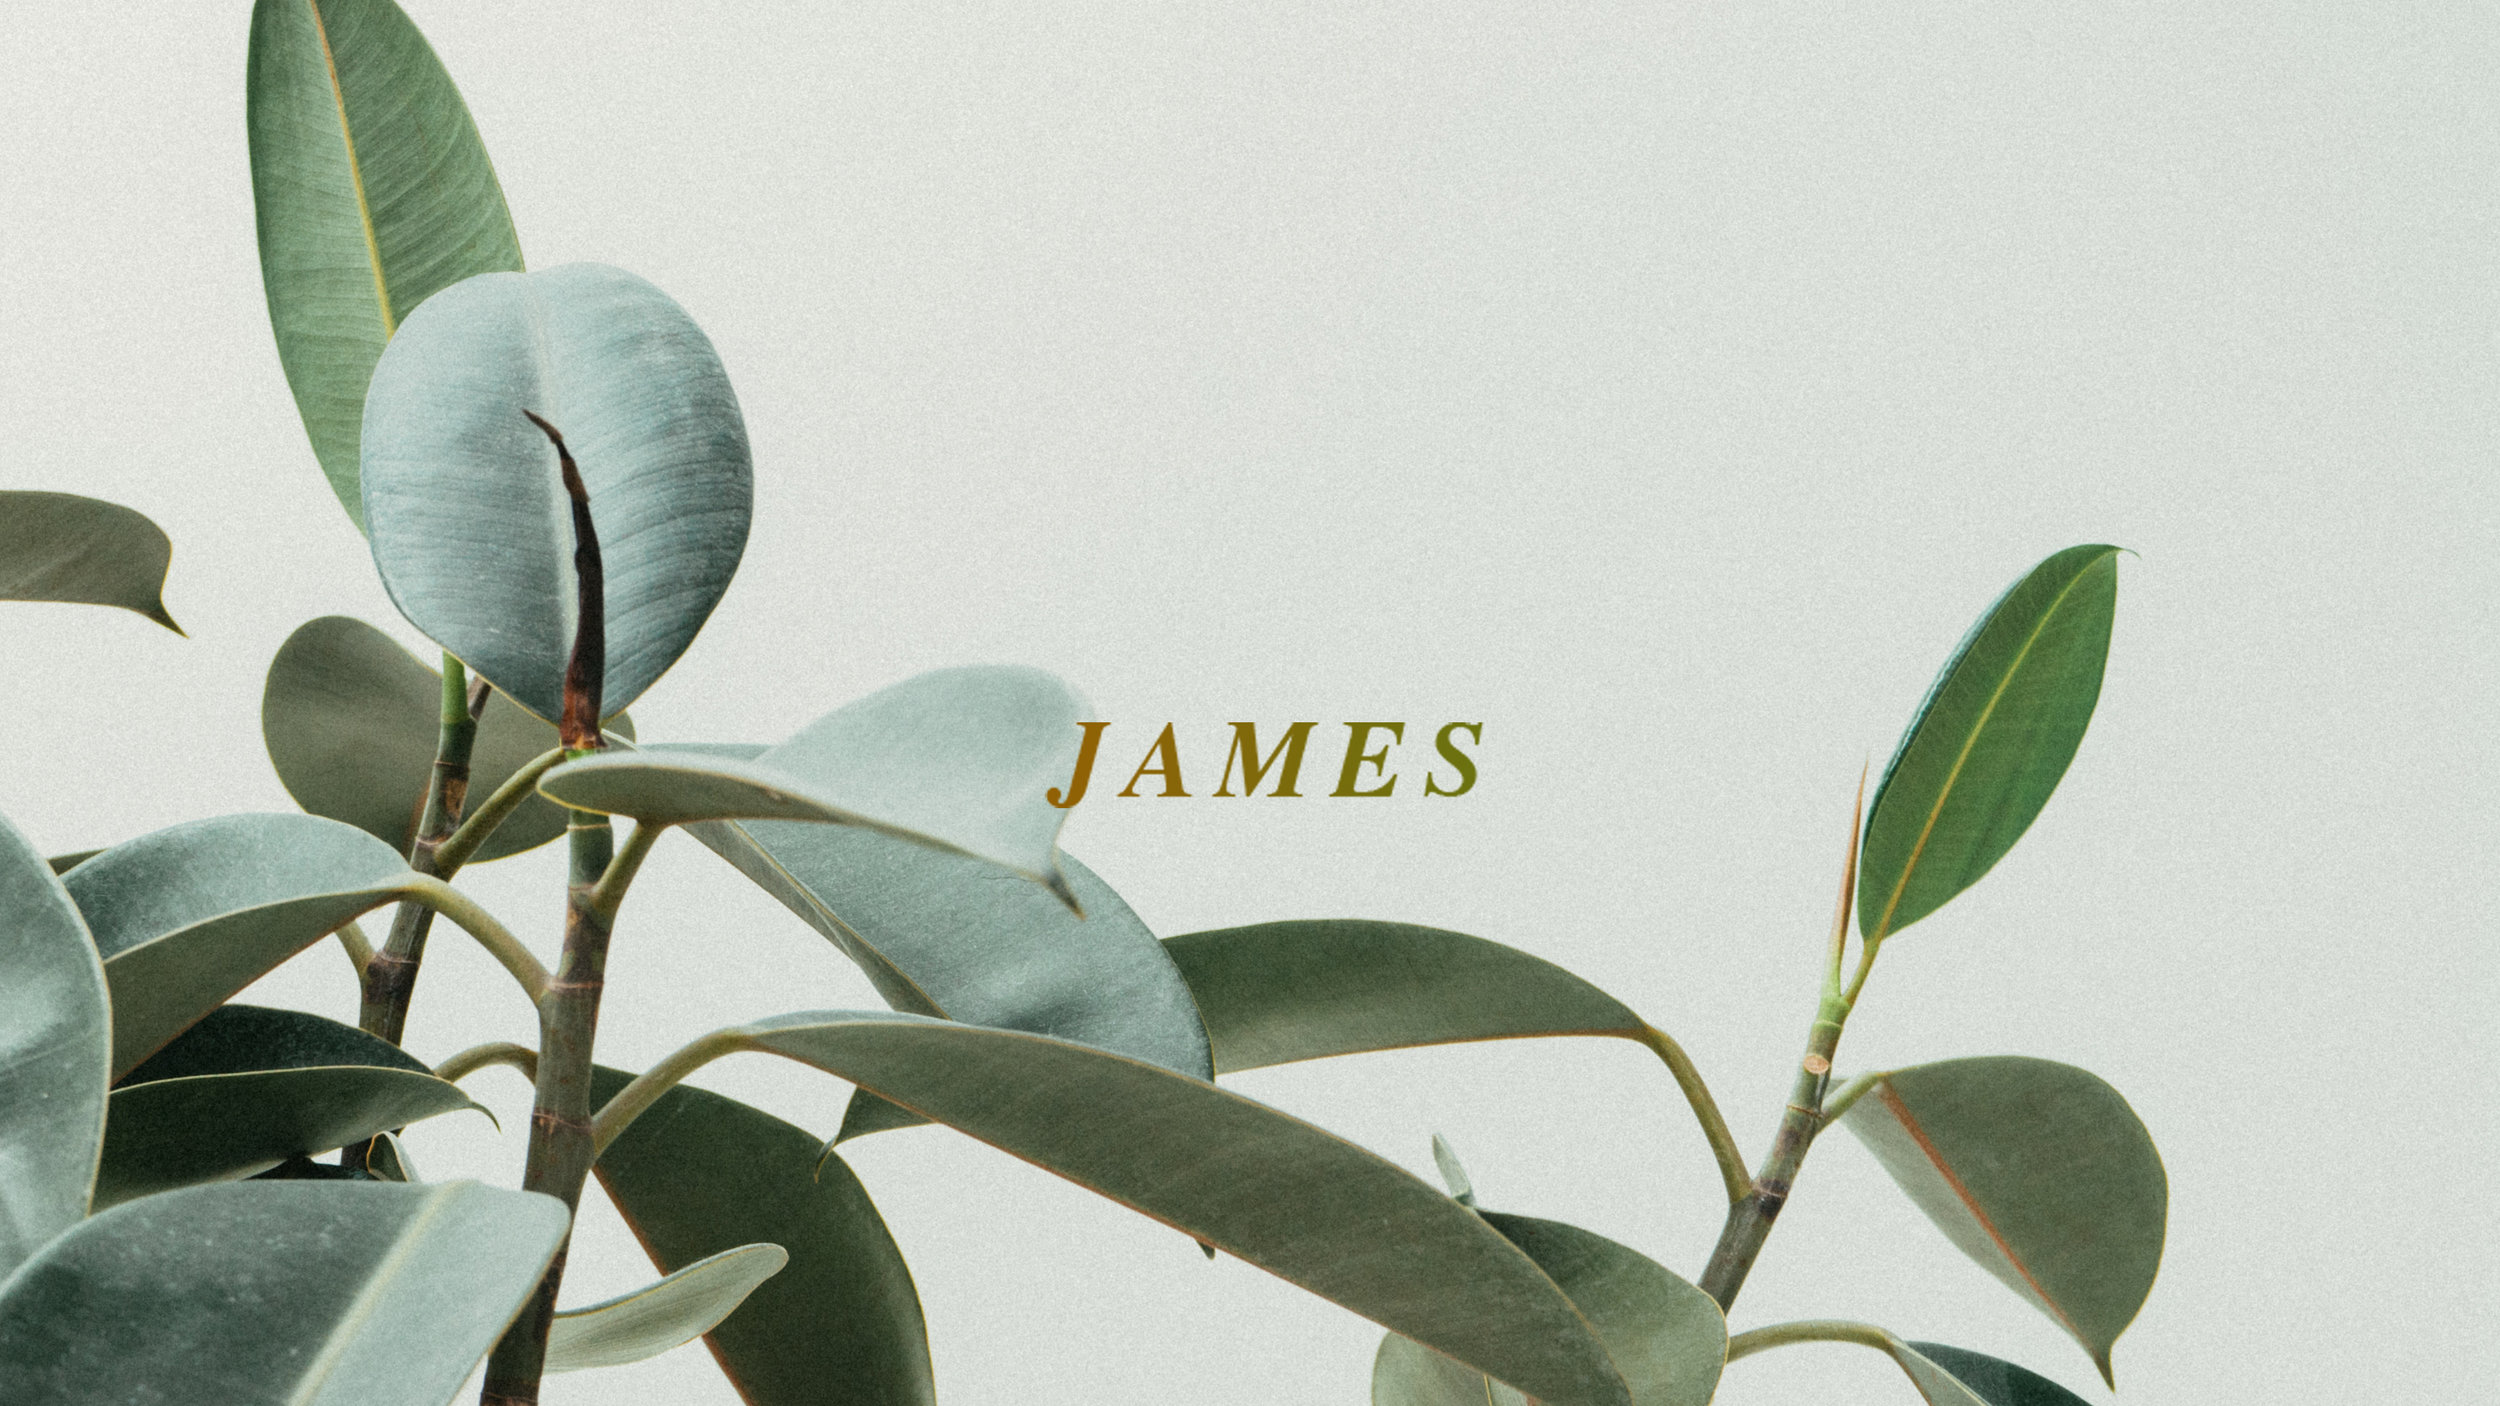 JAMES_1.jpg